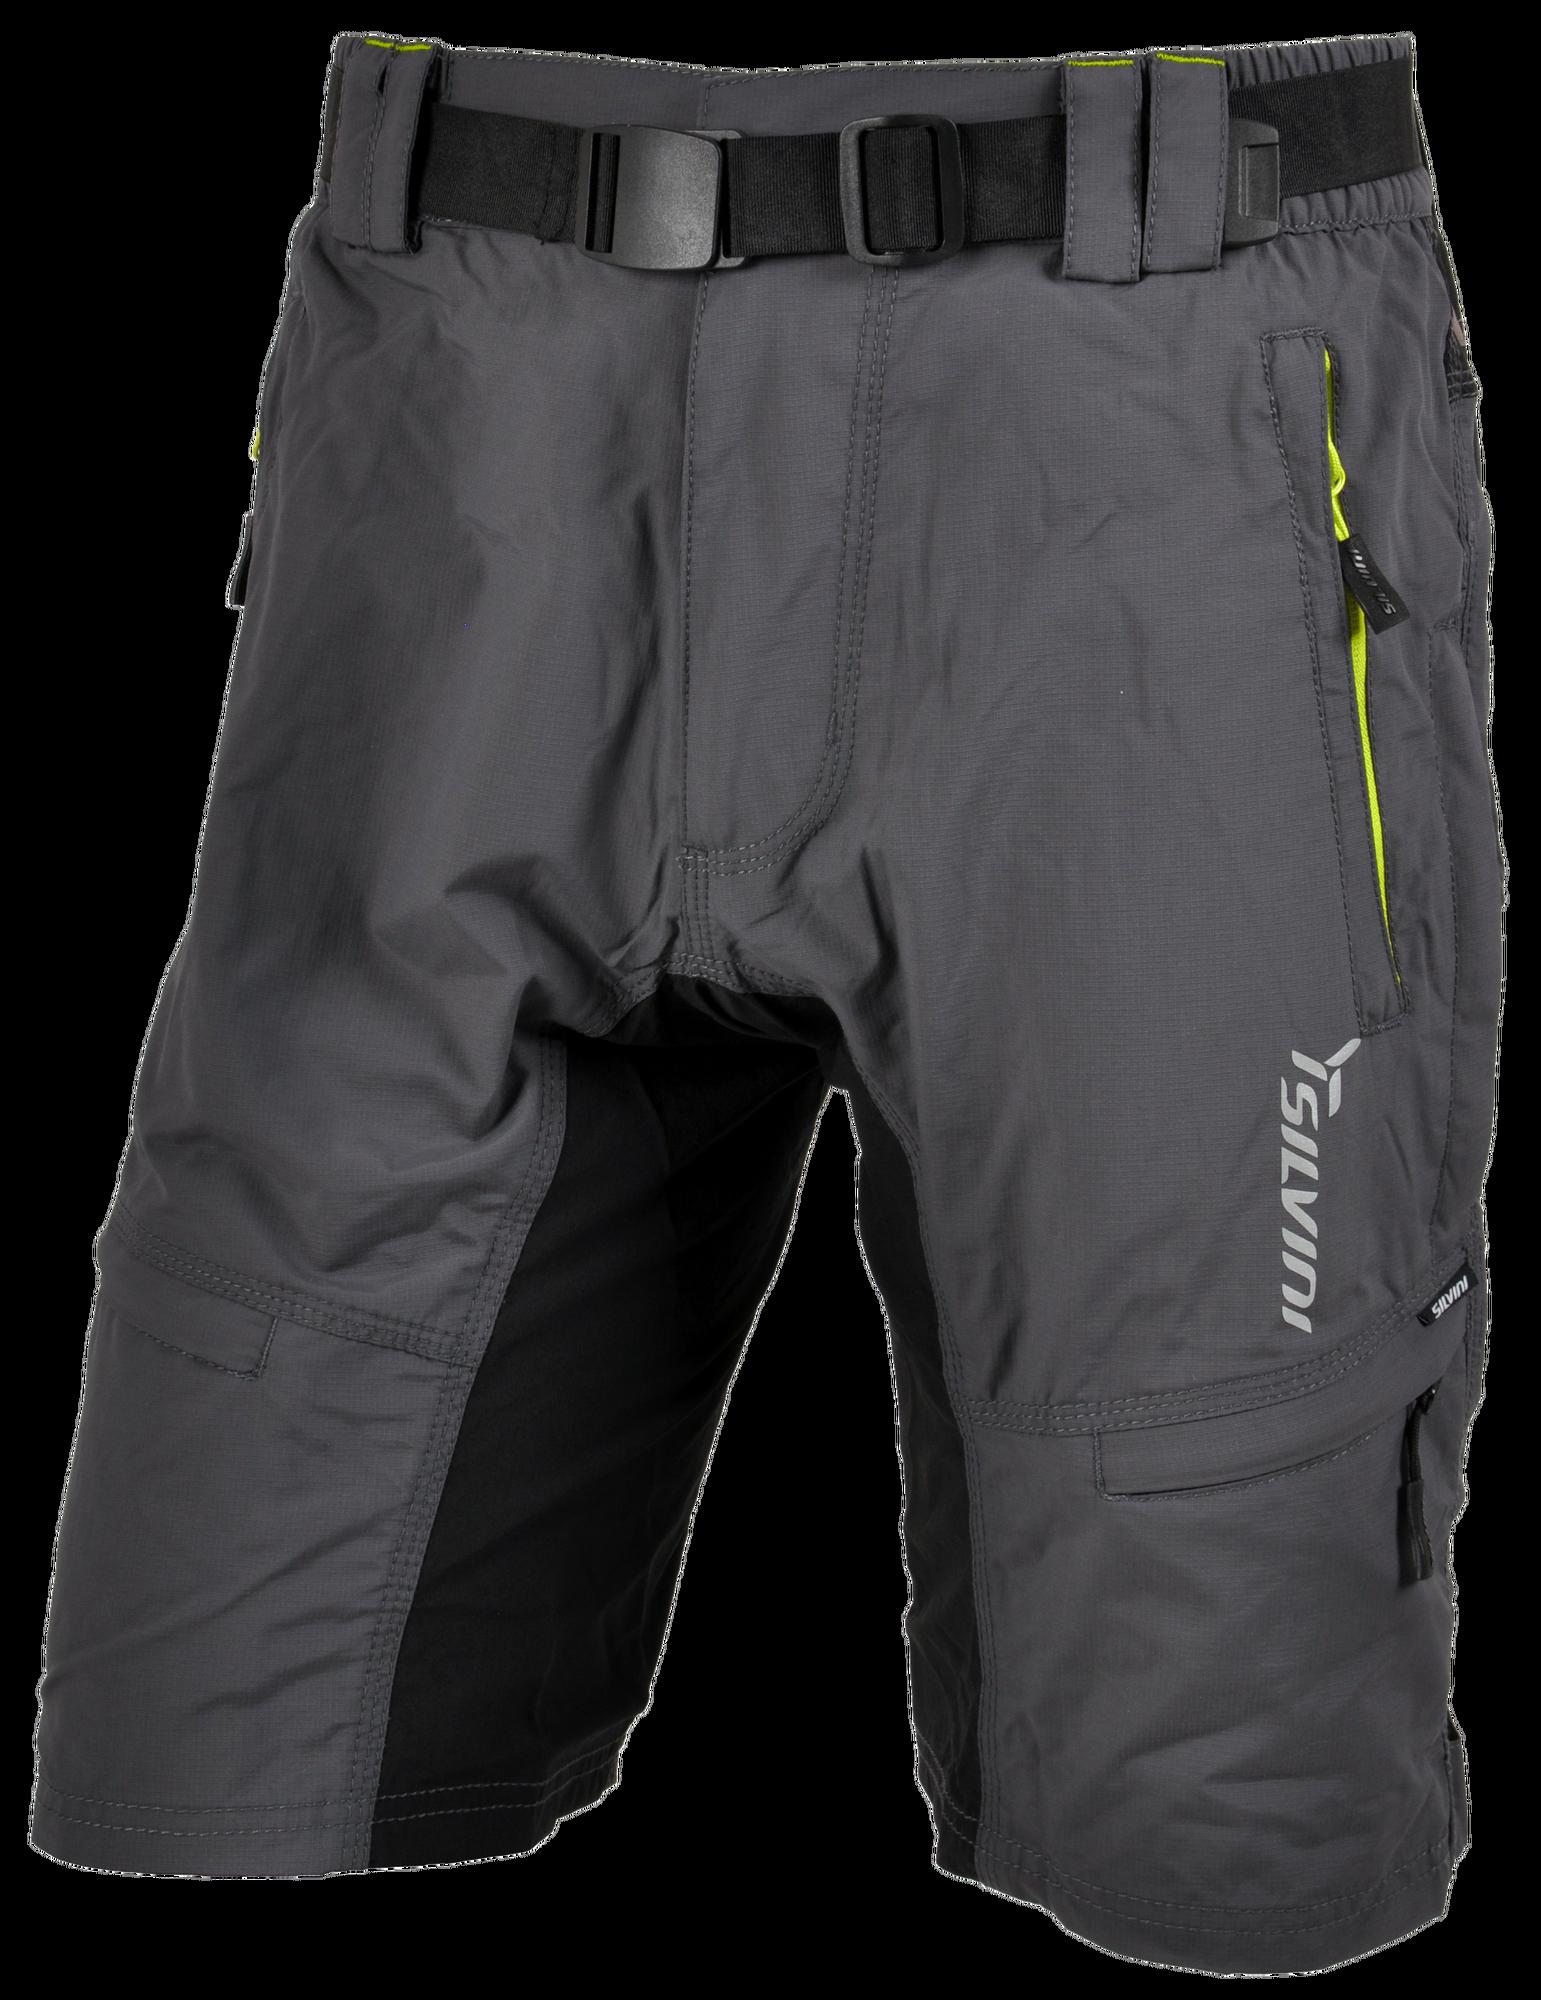 Silvini Cyklistické kalhoty MTB RANGO MP857 volné šedo zelené pánské 04c69d8267